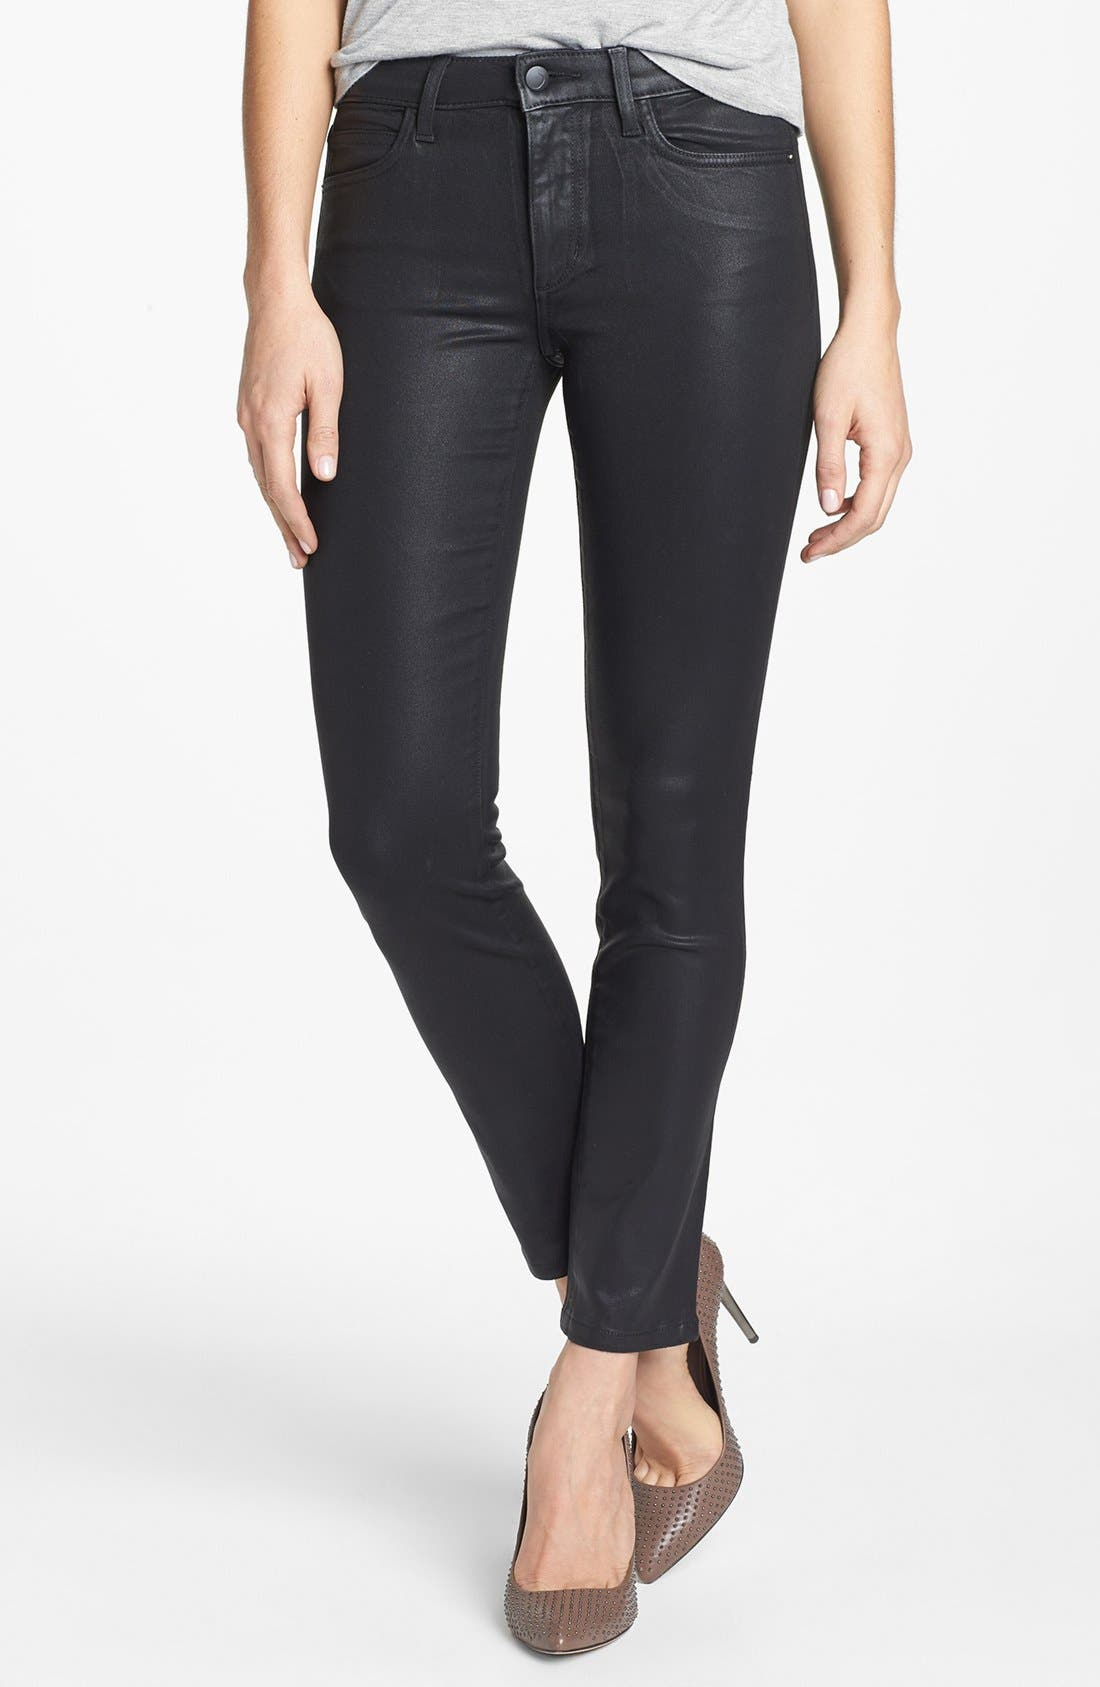 Alternate Image 1 Selected - Joe's Coated Skinny Ankle Jeans (Jet Black)